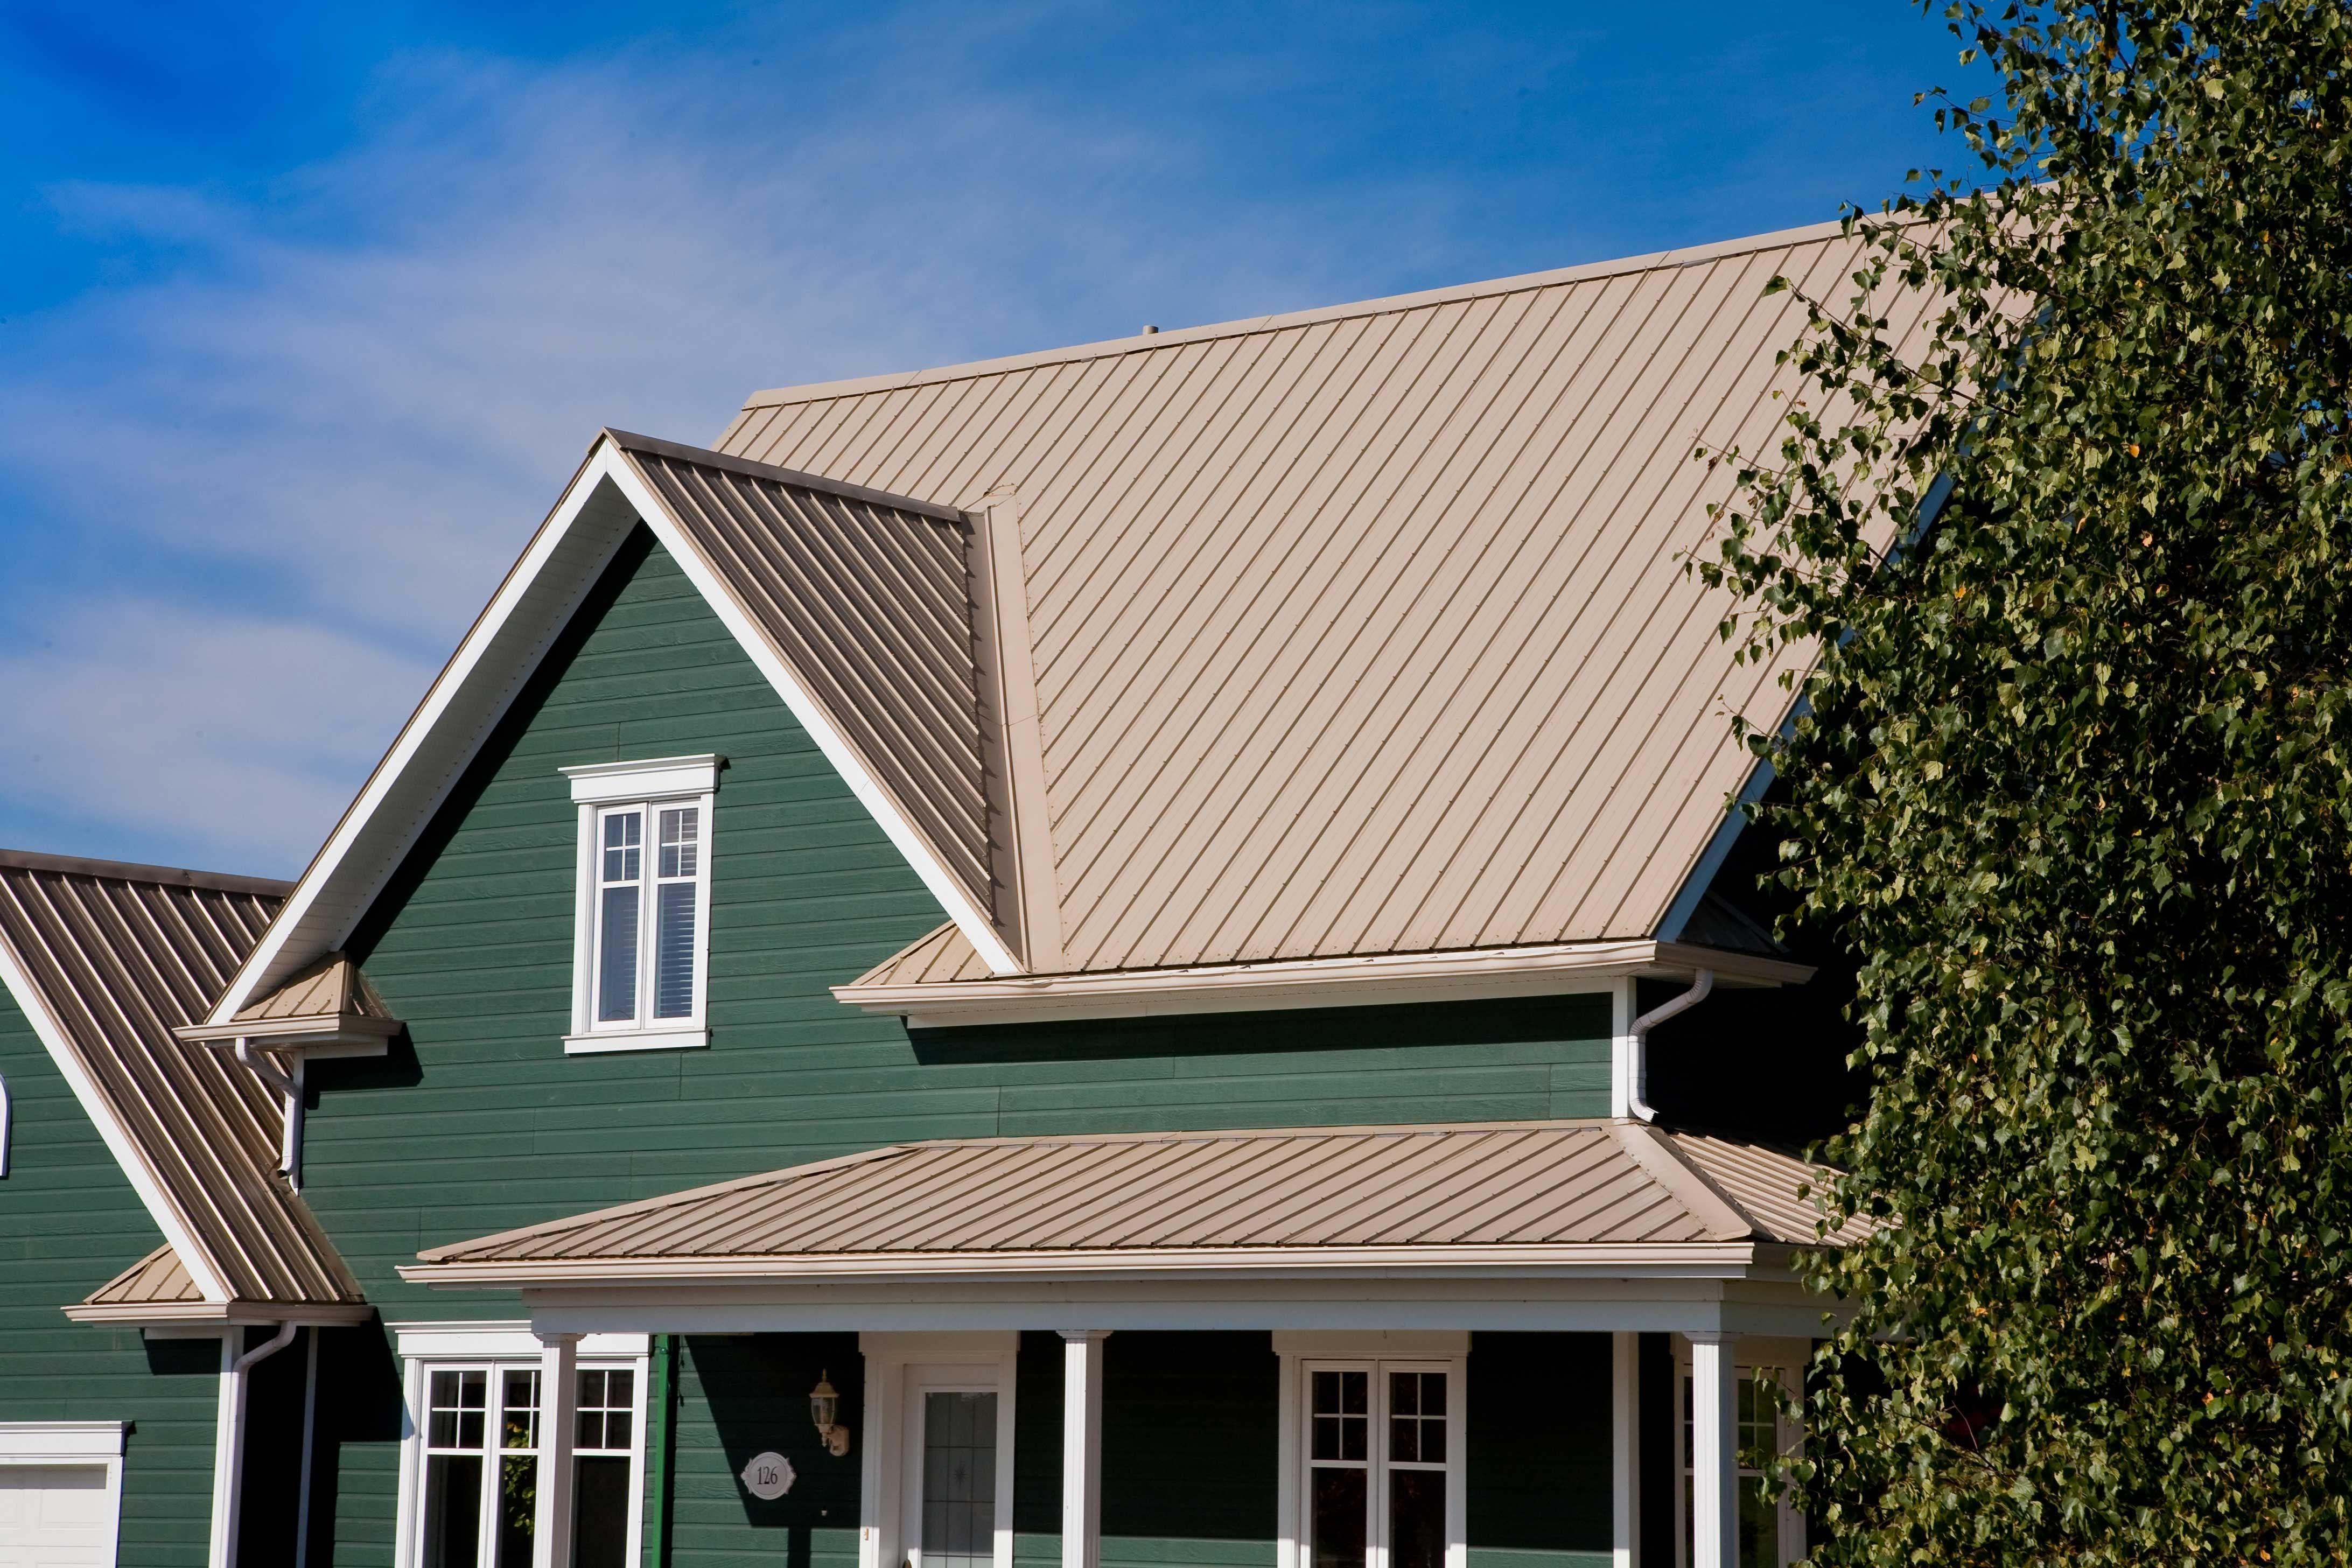 Viceelite Tan 0 Jpg 4368 2912 Pergola Plans Design Metal Roof Patio Roof